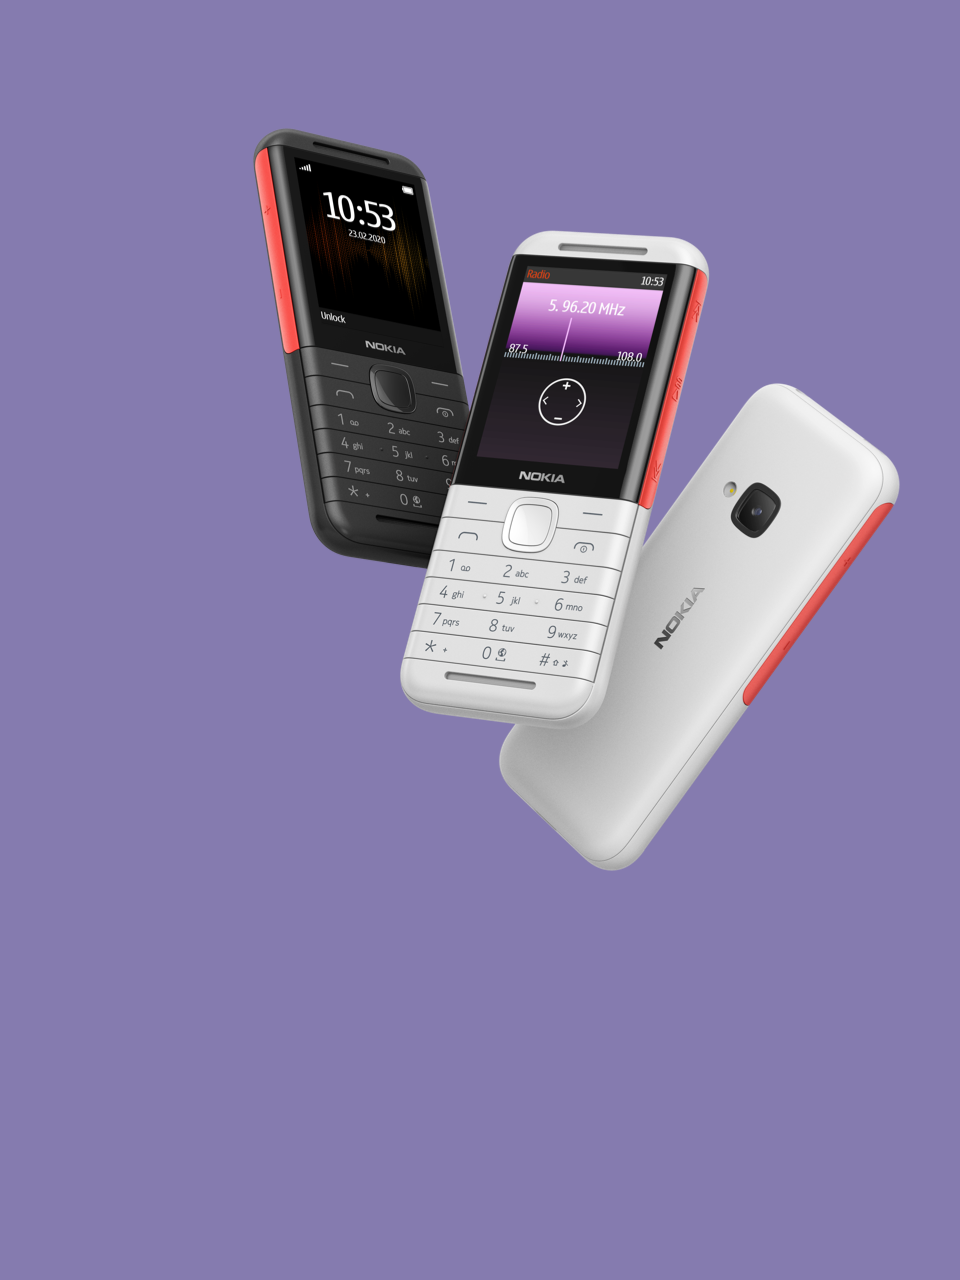 Nokia 5310 2020 Xpressmusic Mobile Phone With Long Lasting Battery Nokia Phones International English